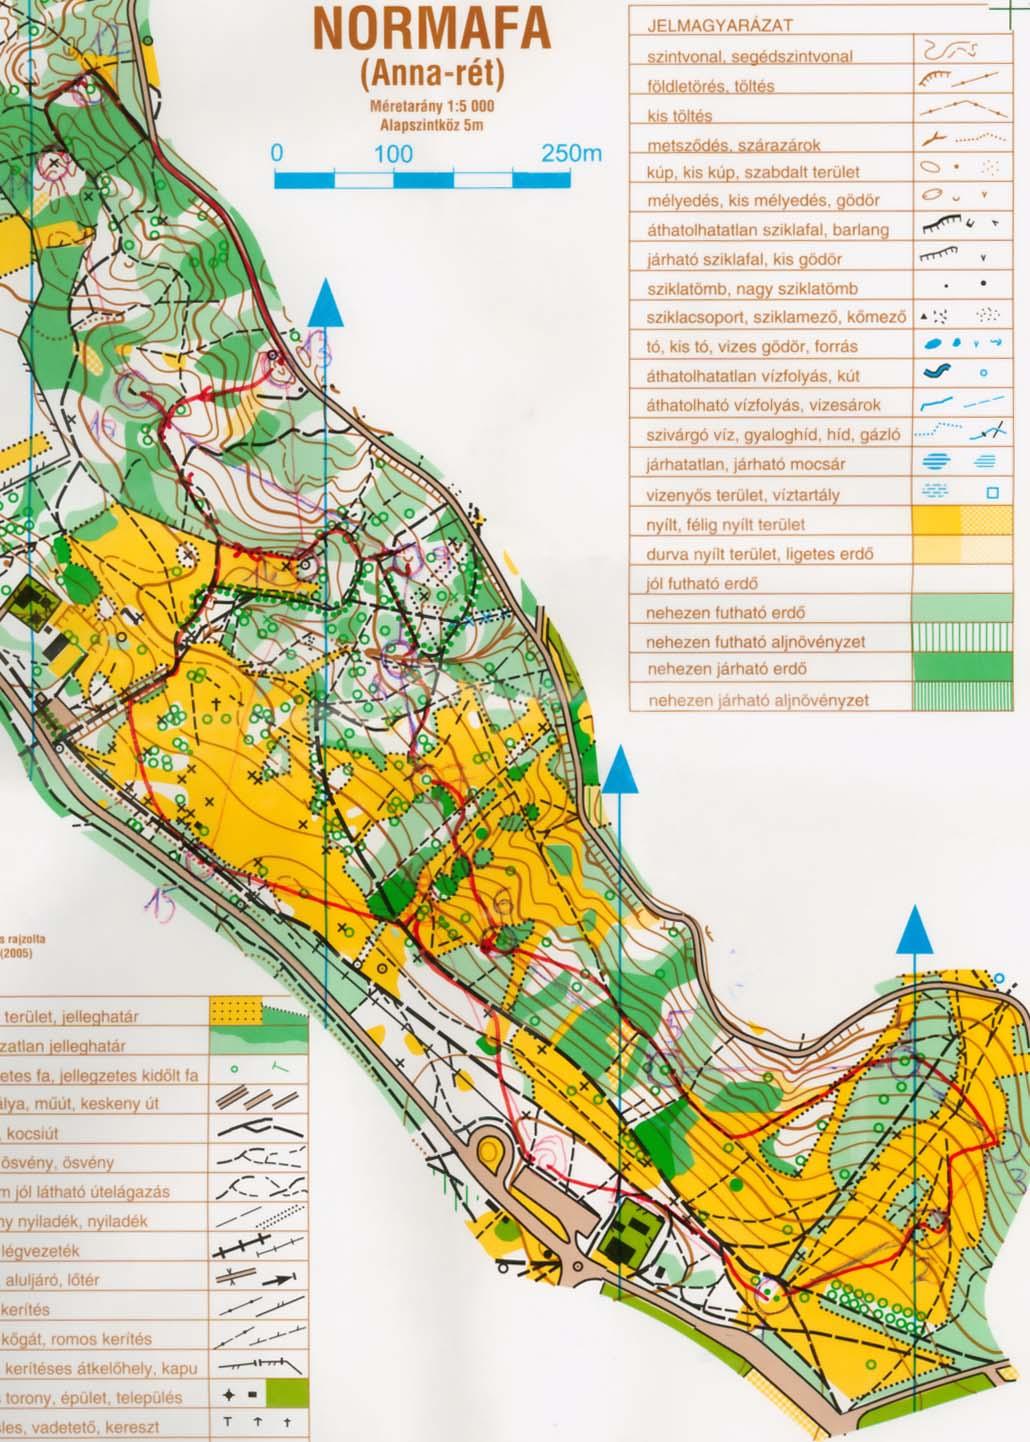 normafa térkép Zentai Laszlo tajfuto multjarol (2006) normafa térkép